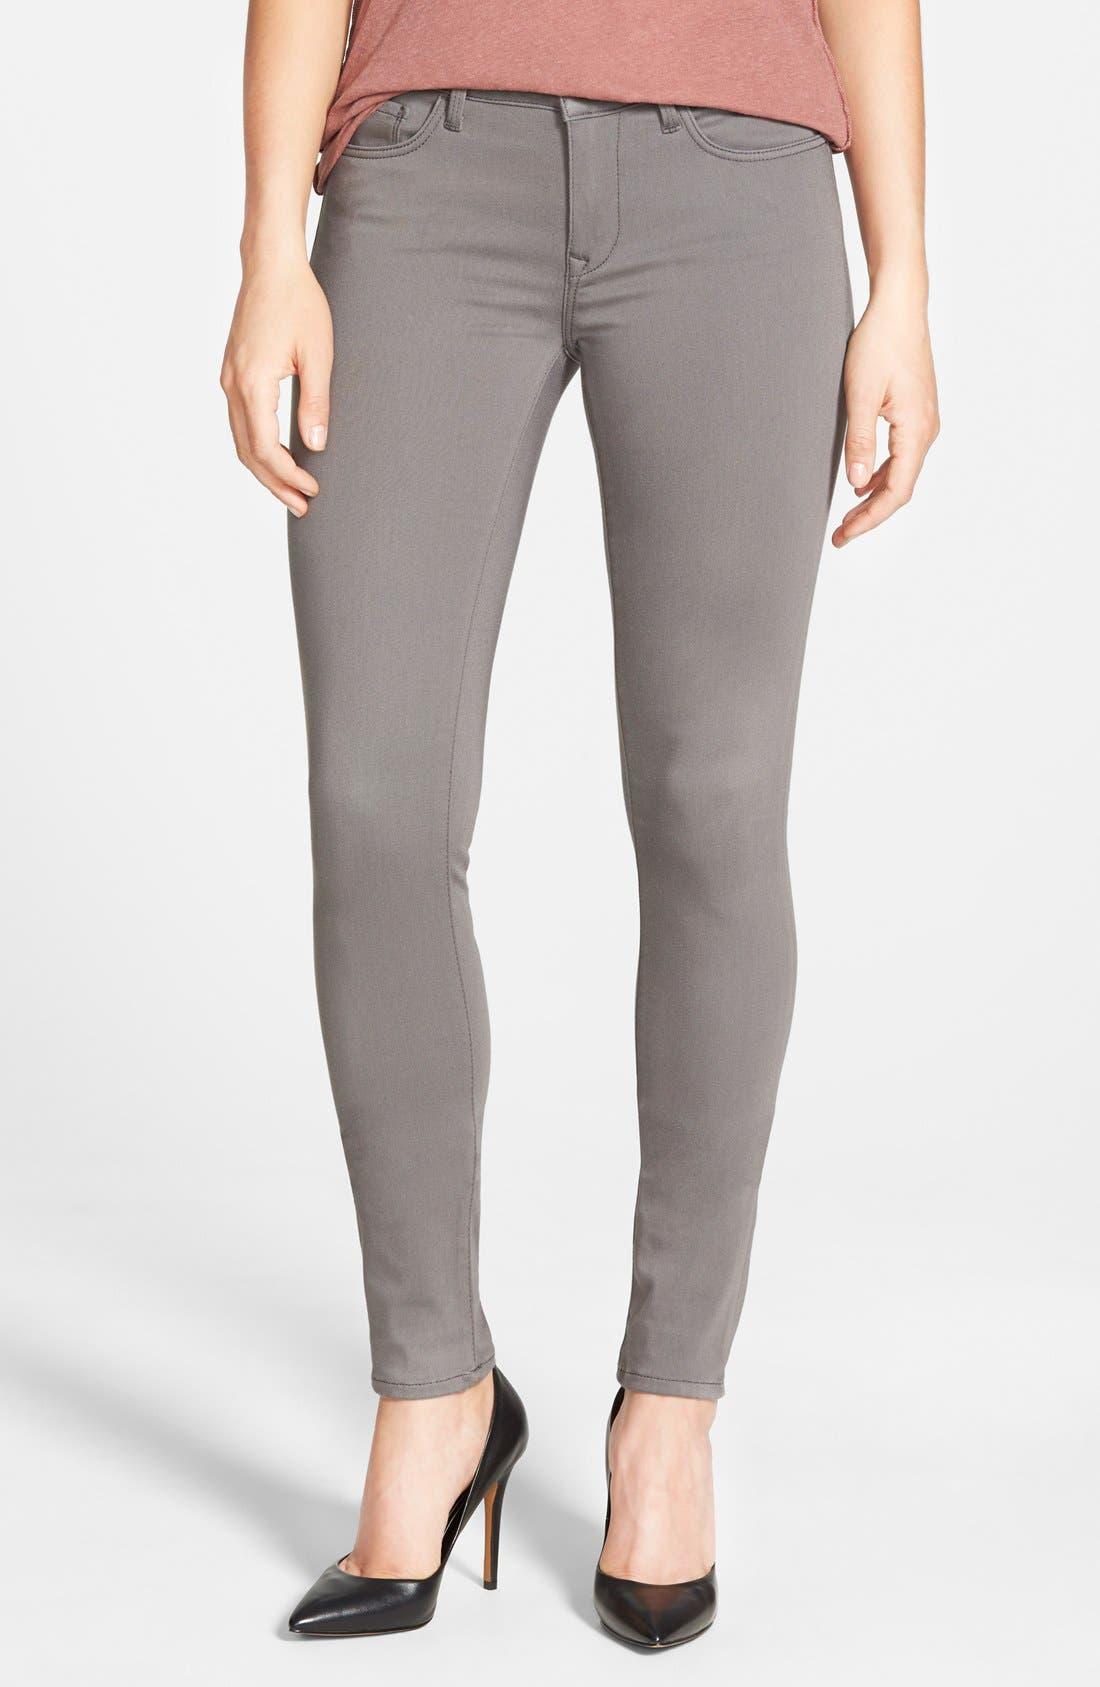 MAVI JEANS MaviJeans Gold Adriana Stretch Super Skinny Jeans